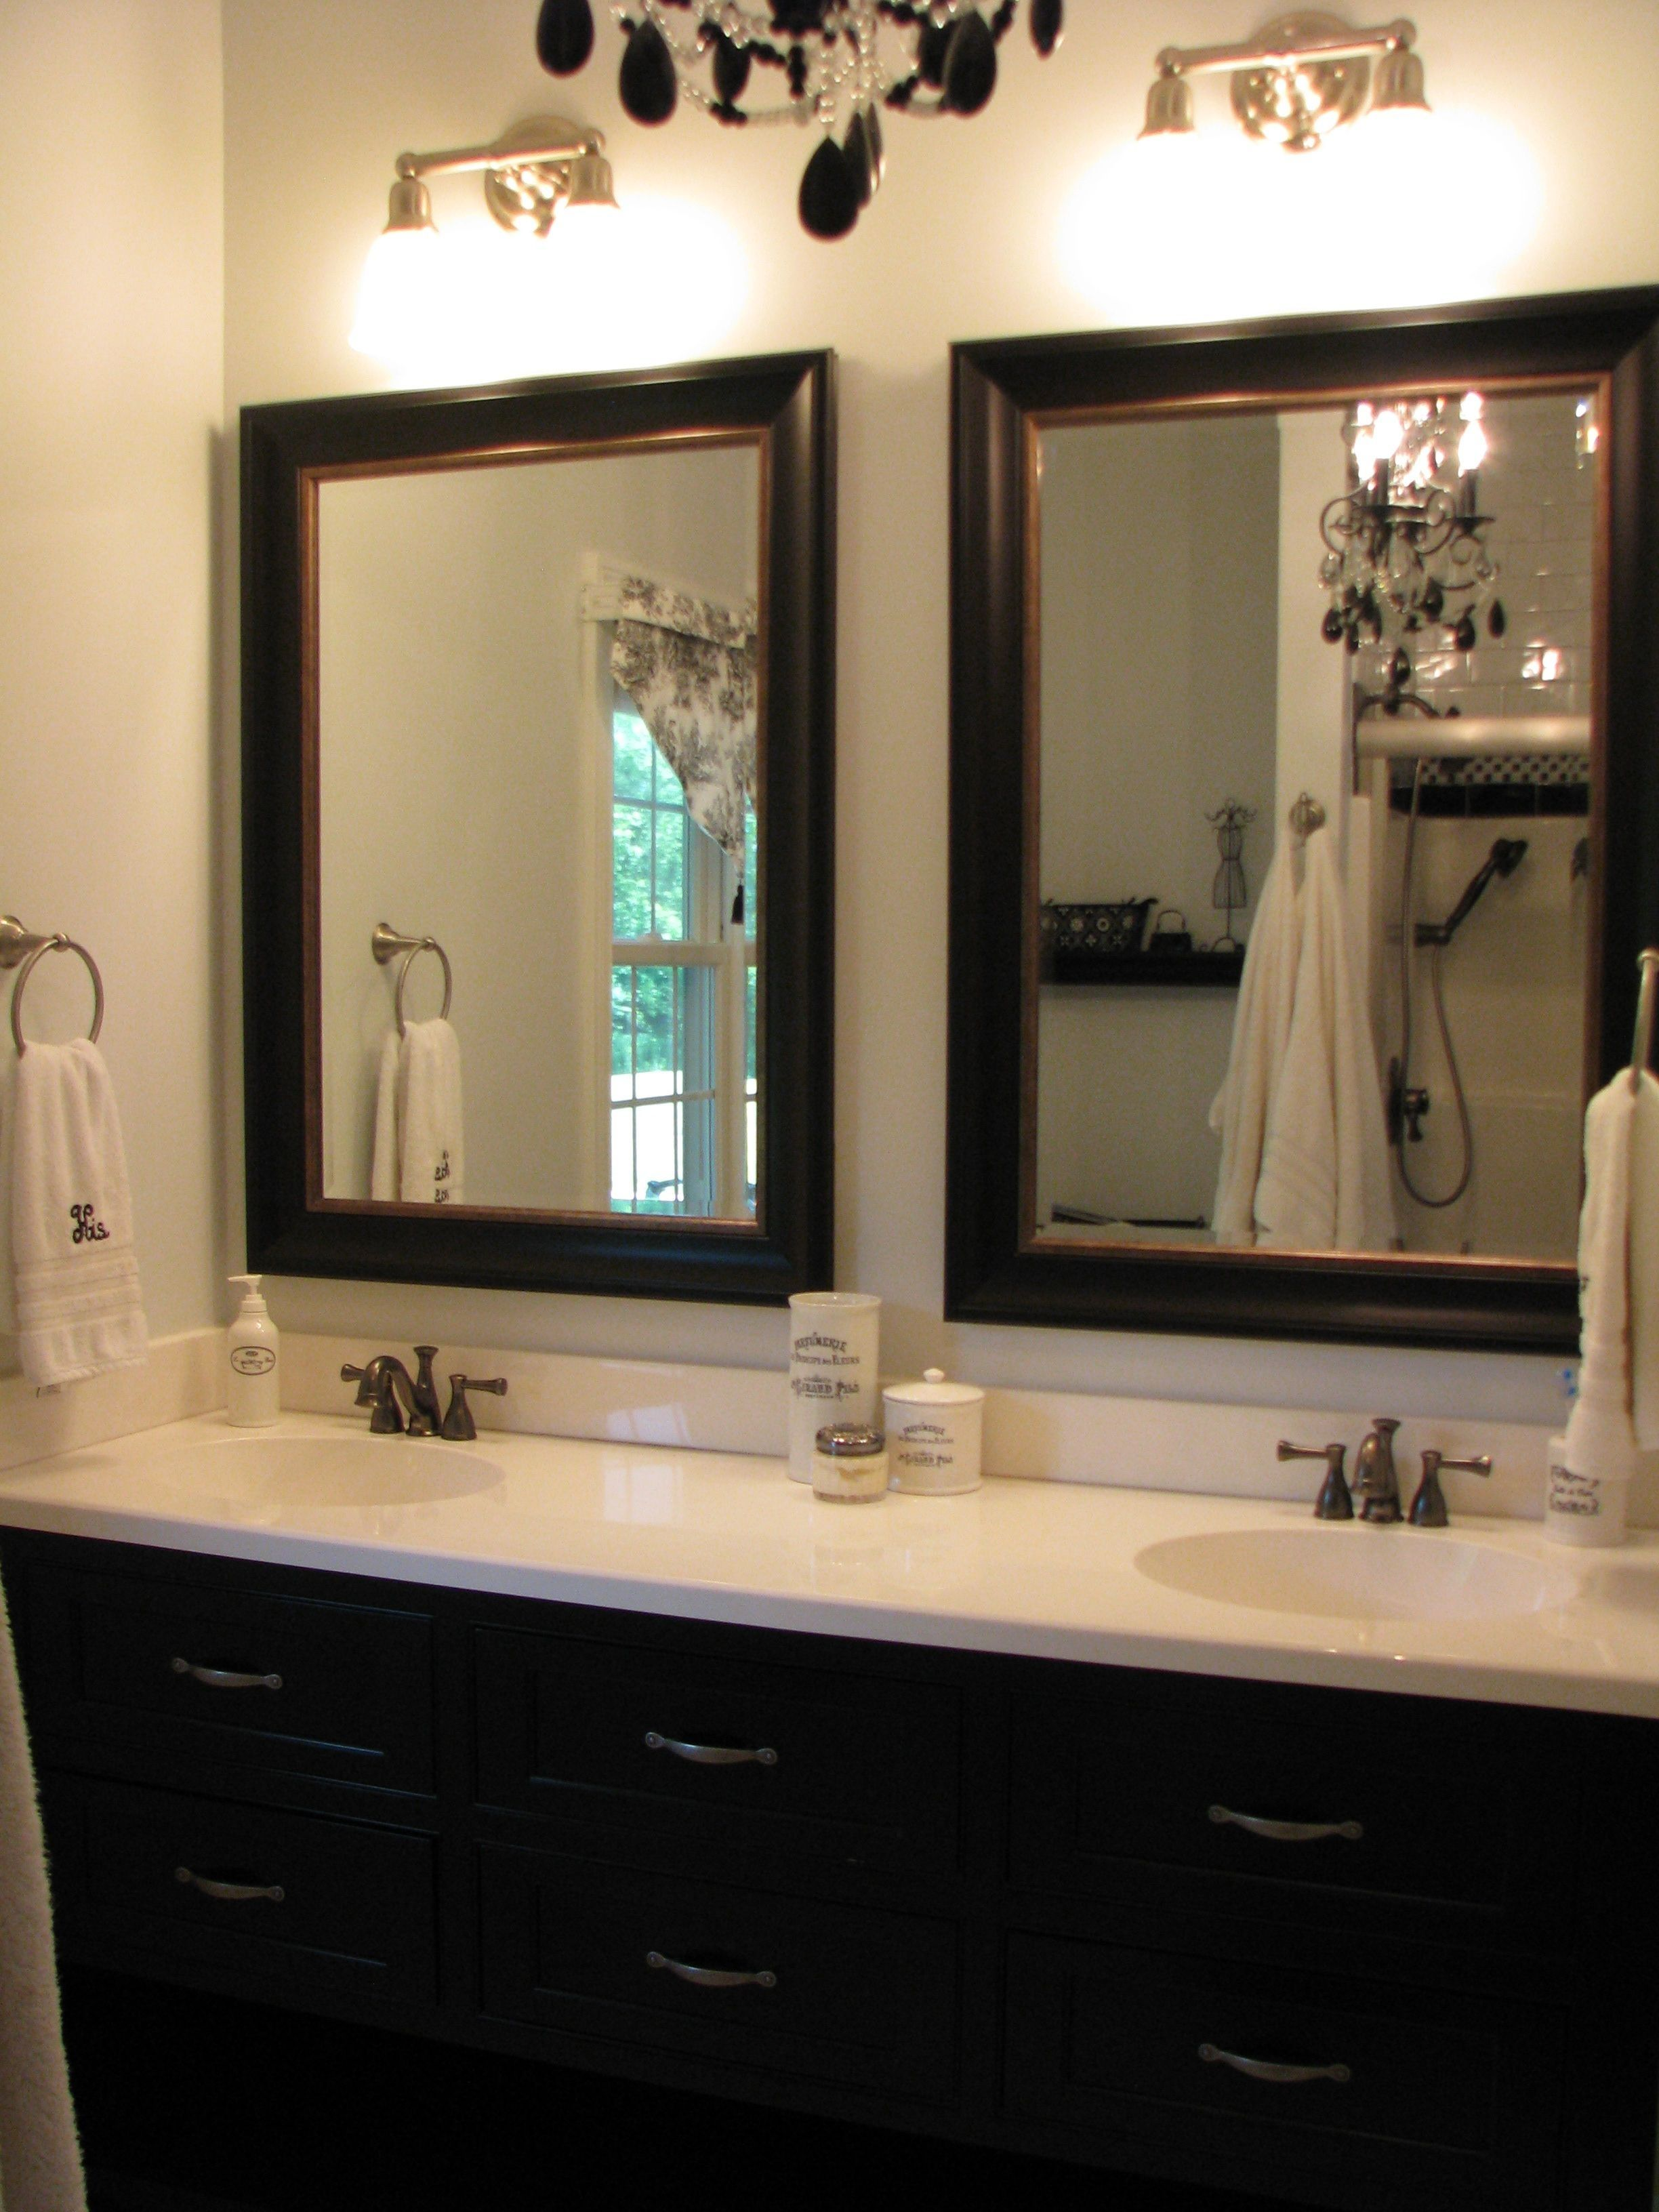 Insanely Beautiful Fresh 2 Sink Bathroom Vanity Ideas Ij15q2 Https